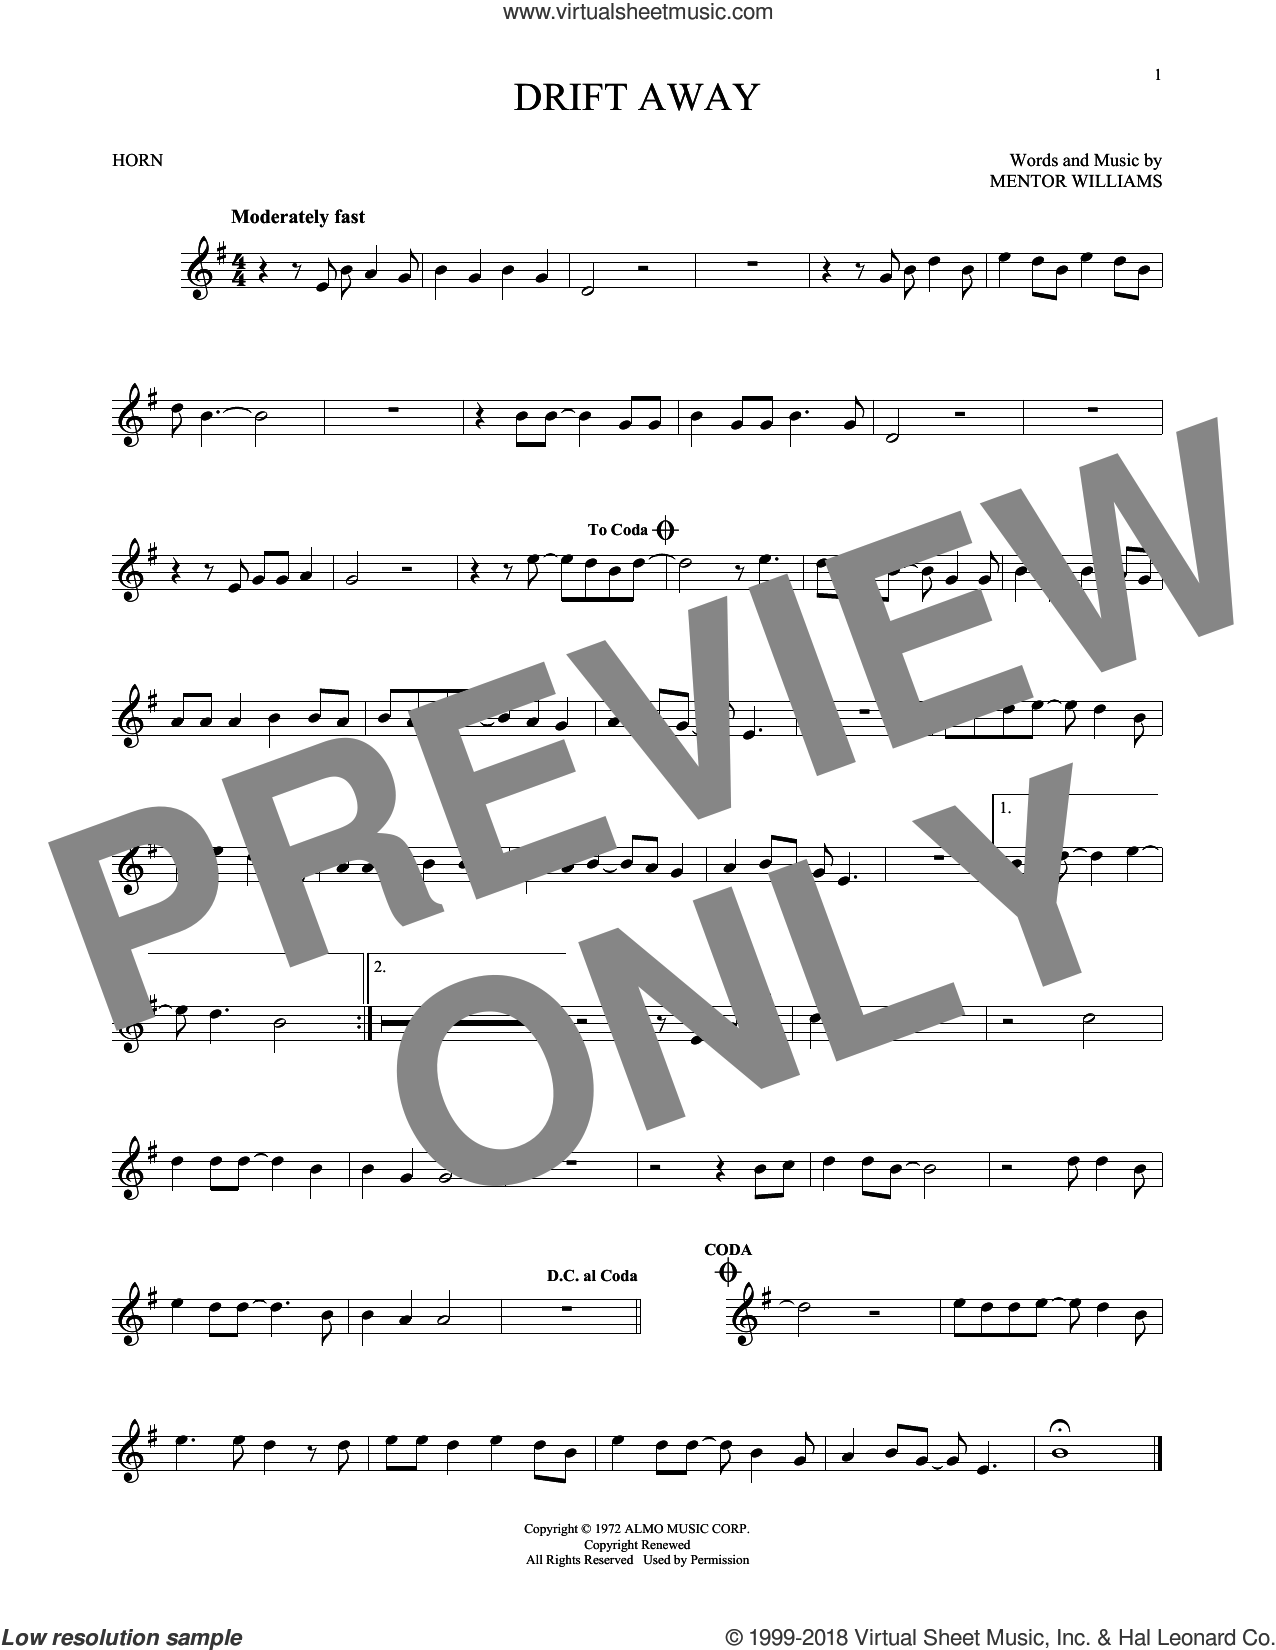 Drift Away sheet music for horn solo by Dobie Gray and Mentor Williams, intermediate skill level